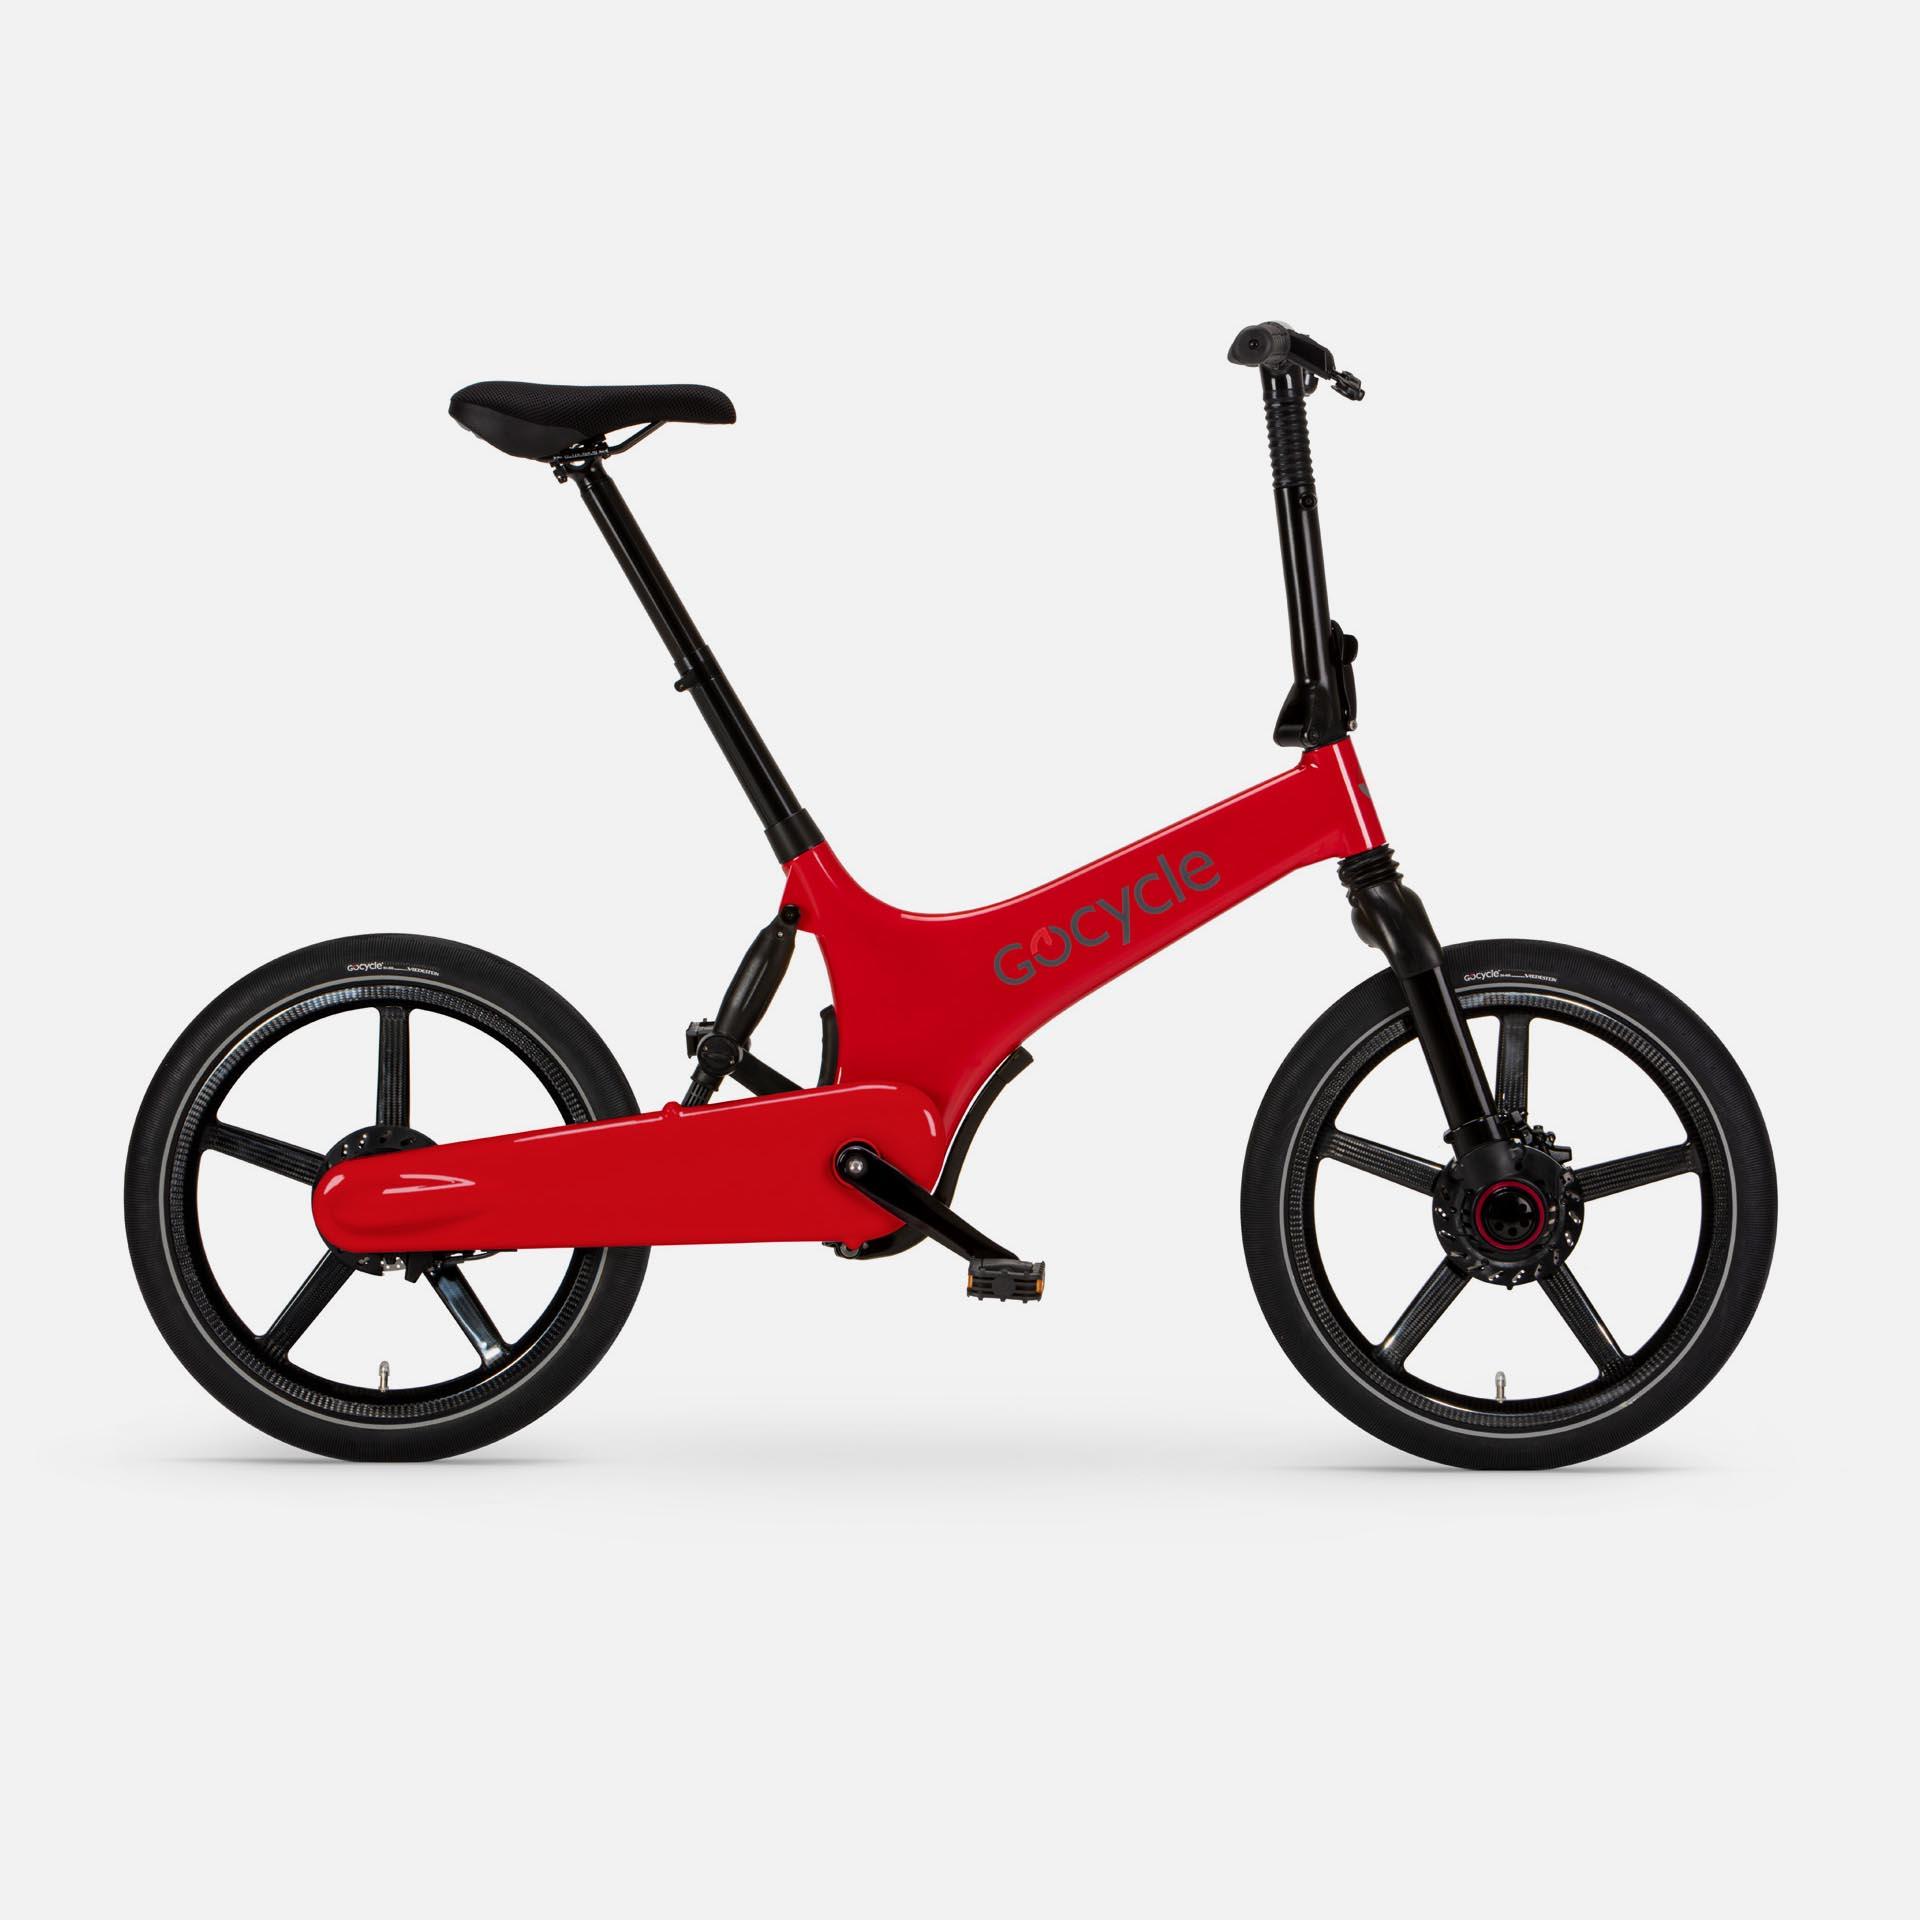 Gocycle G3+ Red (Front Brake Left)